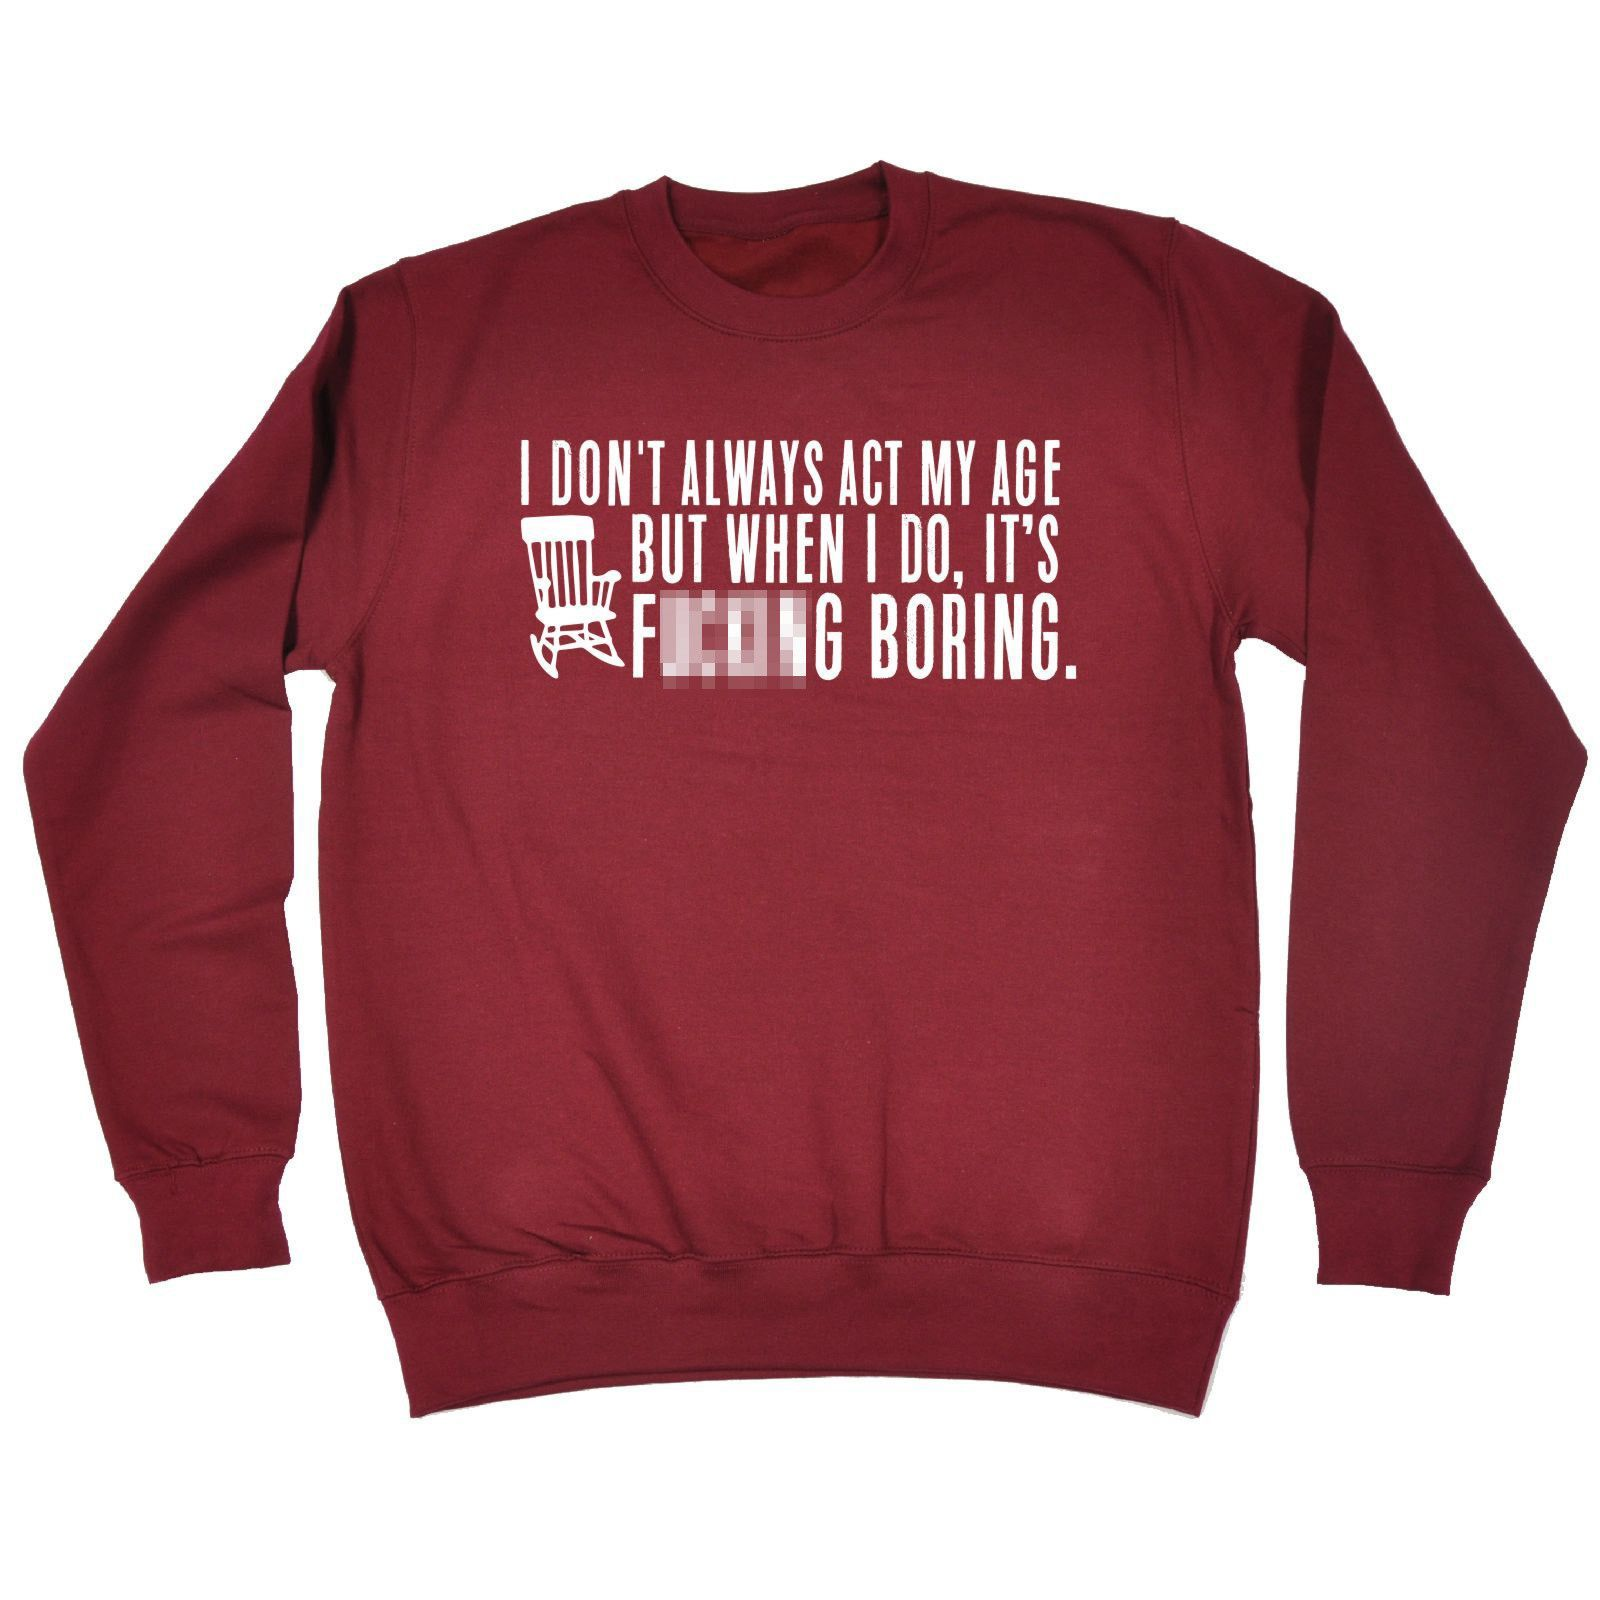 123t USA I Don't Always Act My Age F**king Boring Funny Sweatshirt